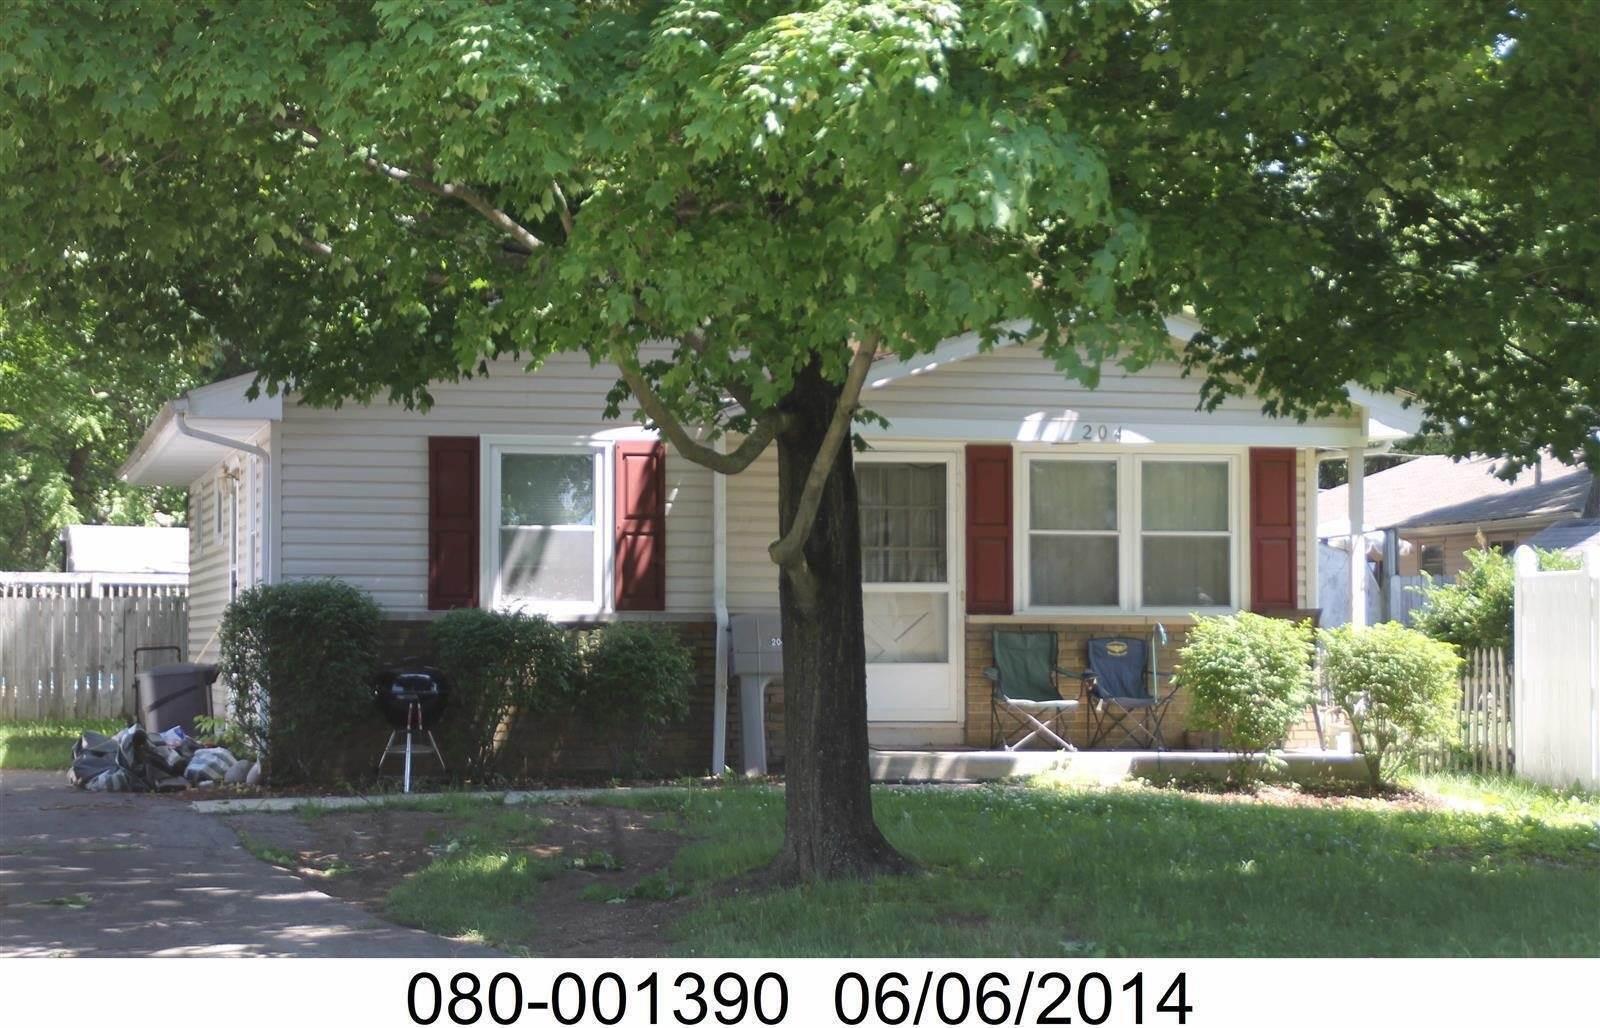 204 East Walnut Street, Westerville, OH 43081